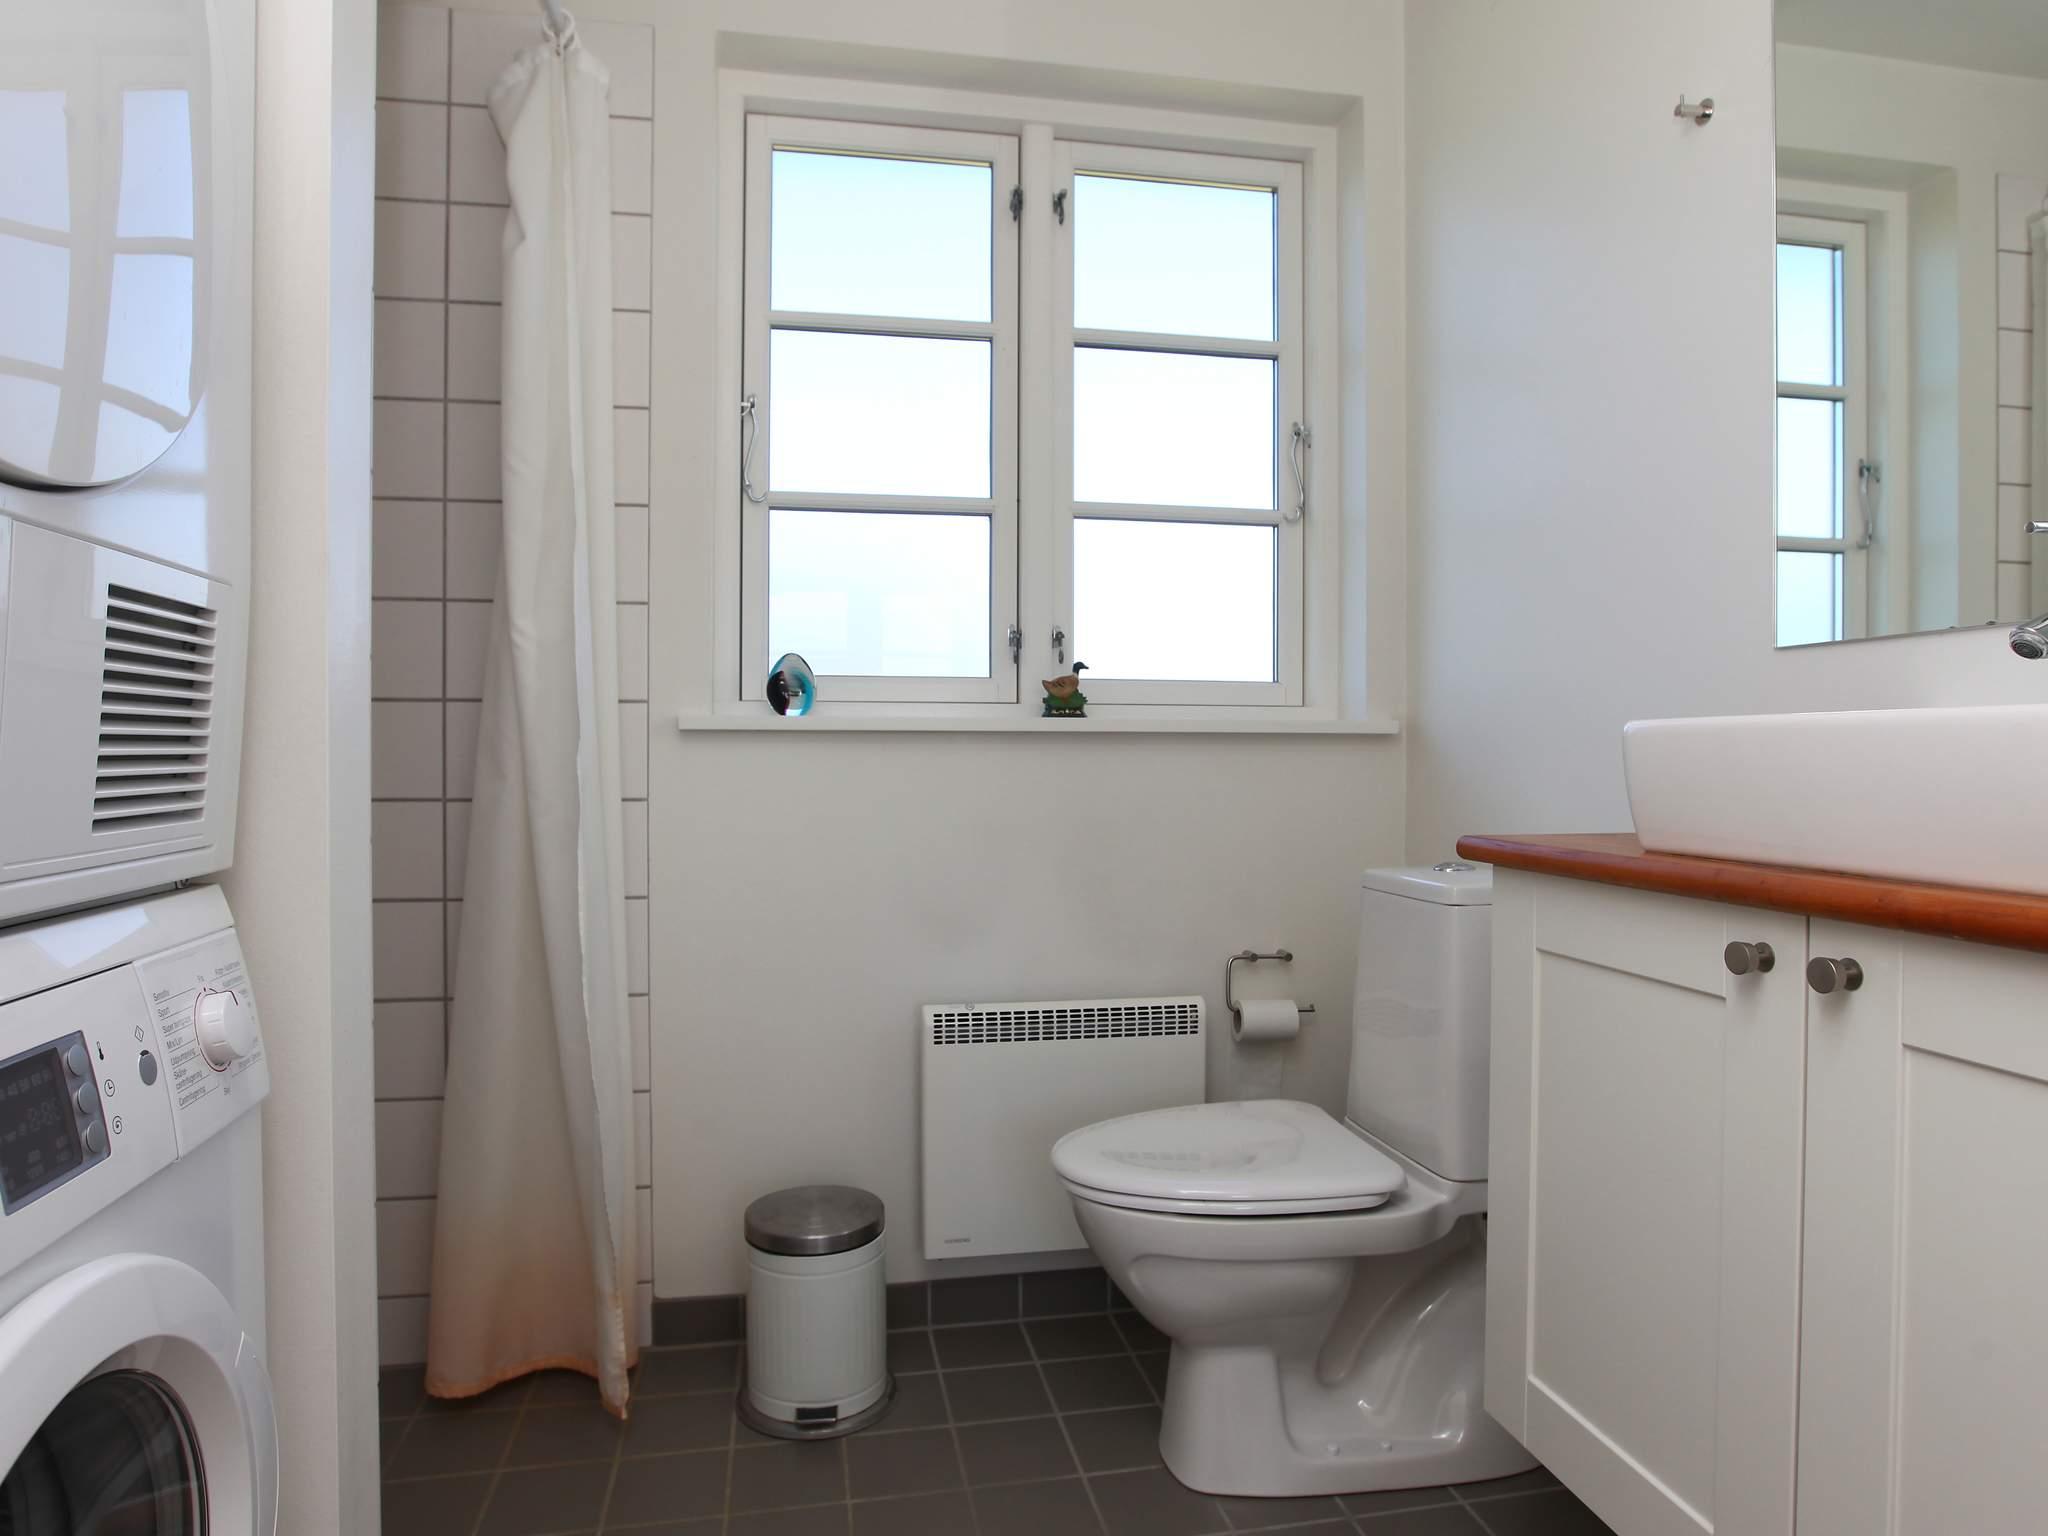 Ferienhaus Nysted (377267), Nysted, , Lolland, Dänemark, Bild 13